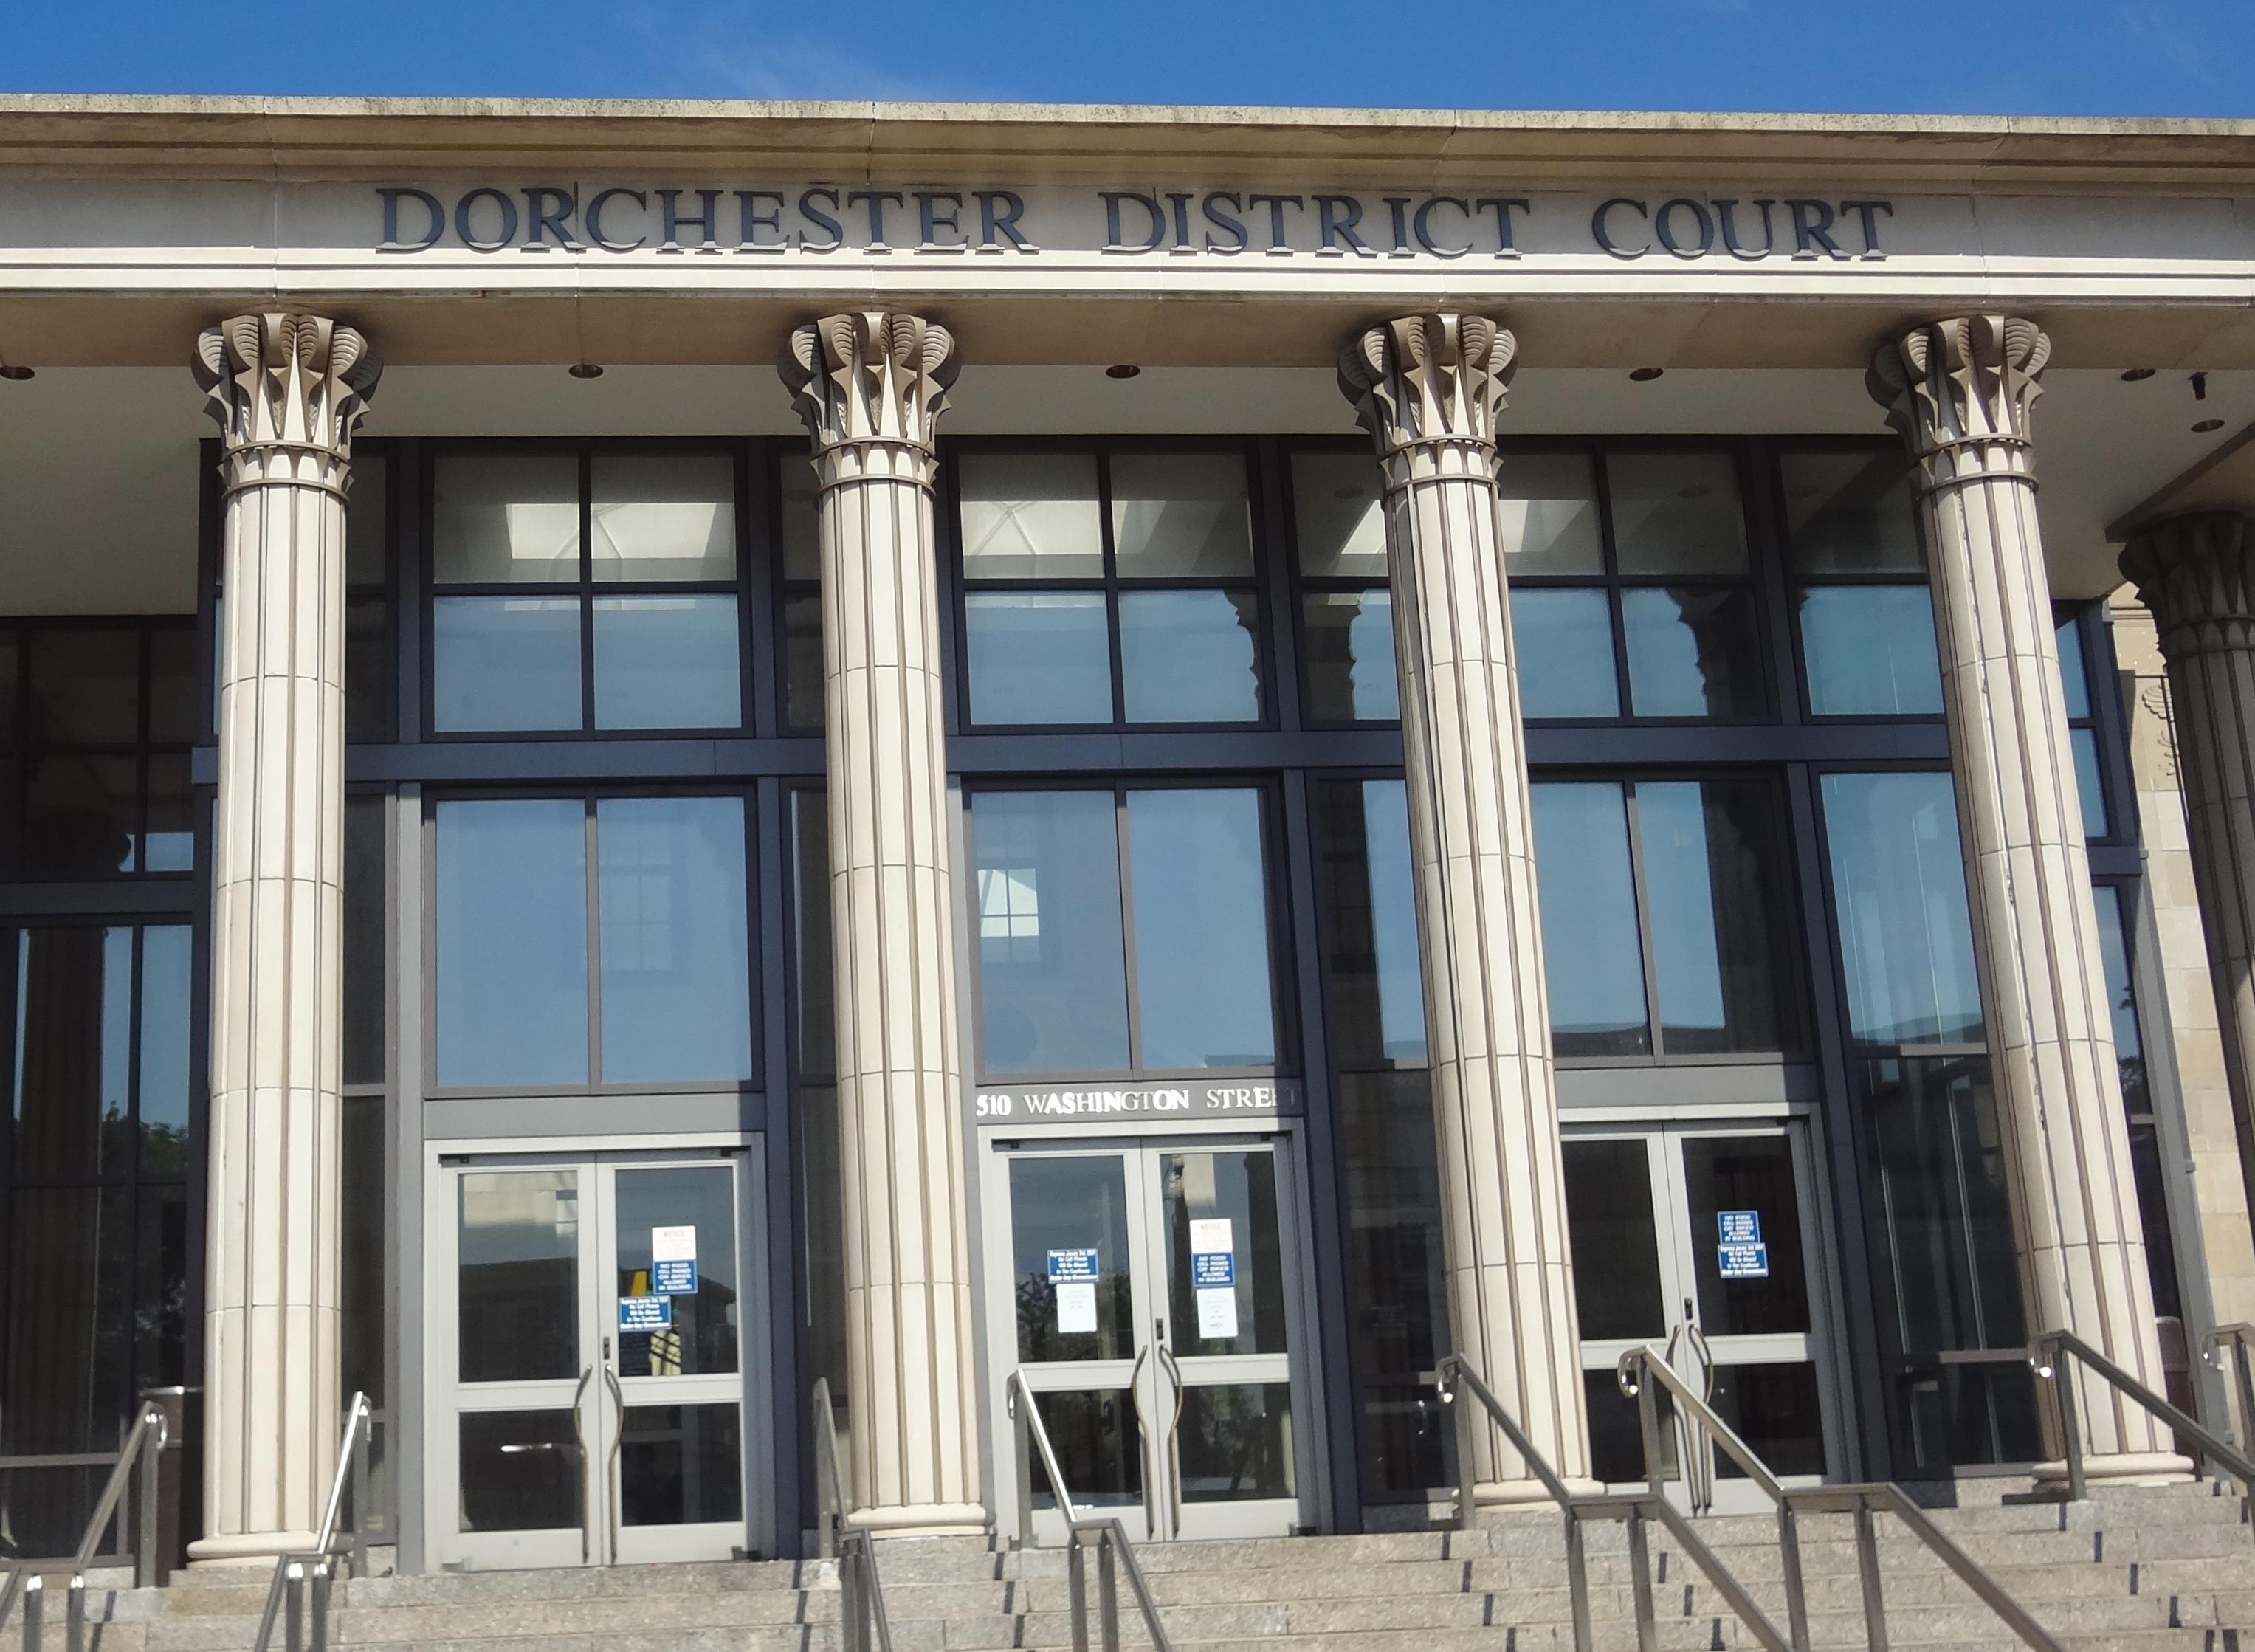 Dorchester District Court